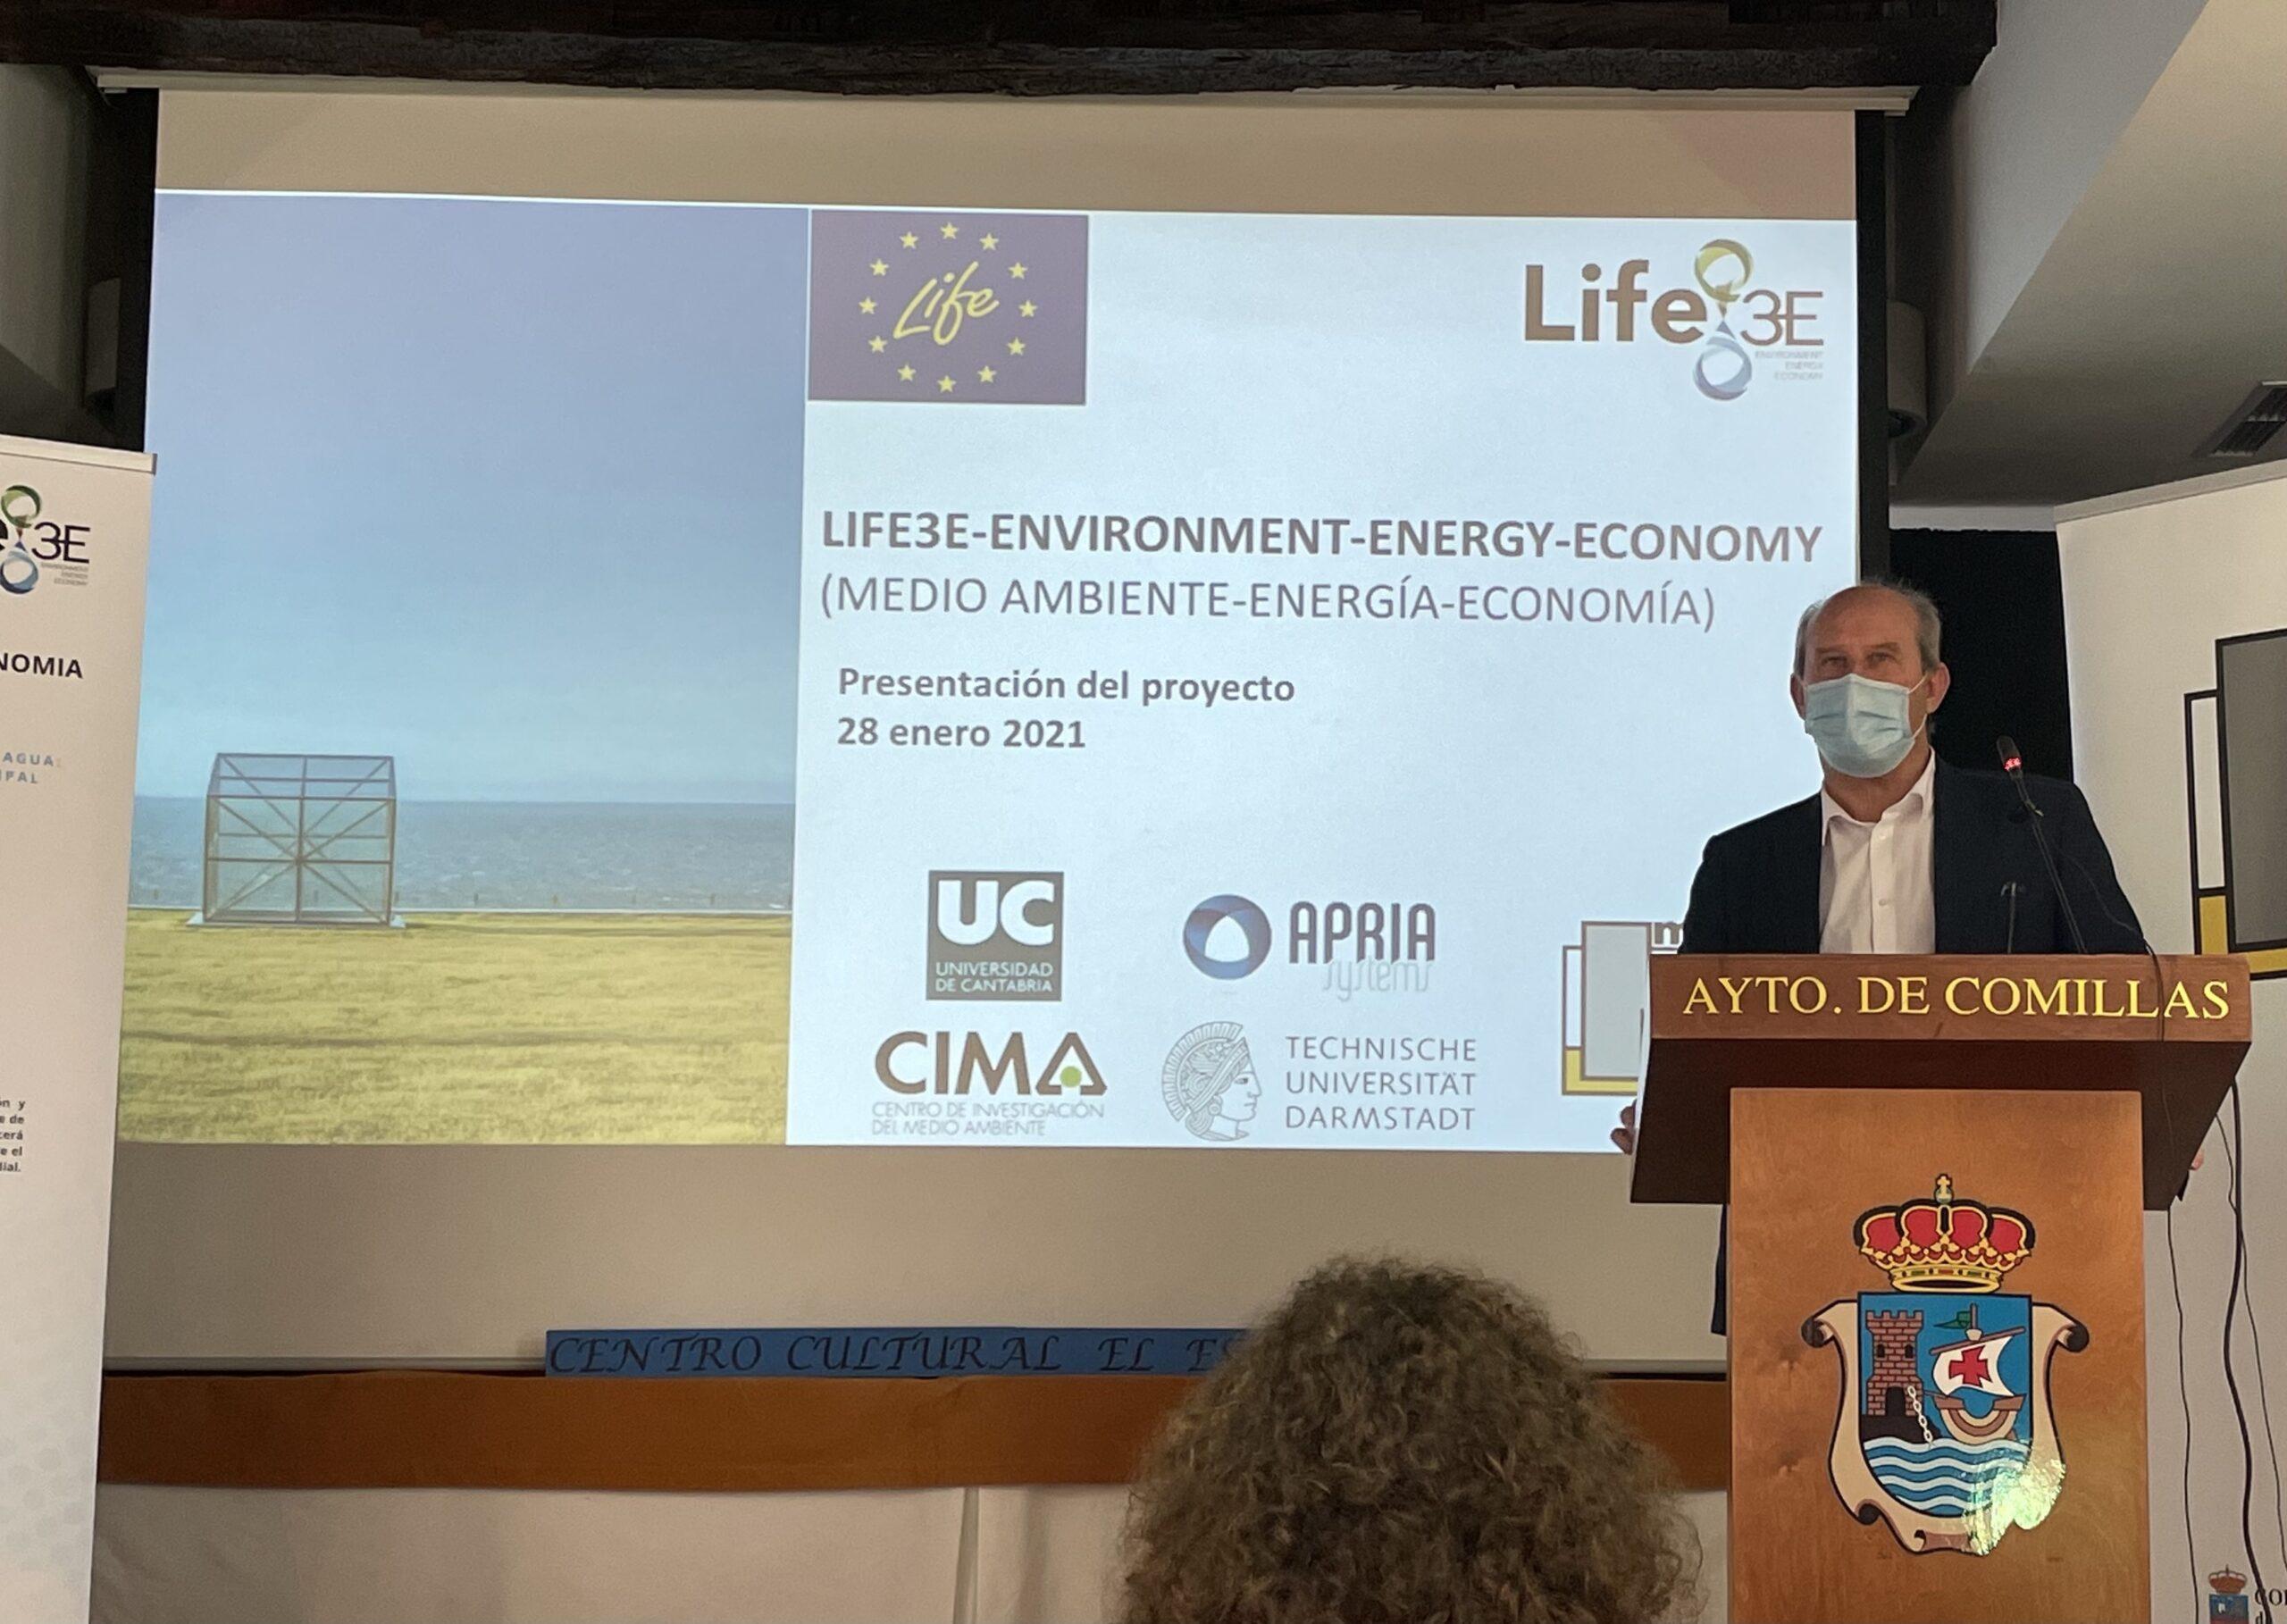 Presentation of the European project LIFE-3E